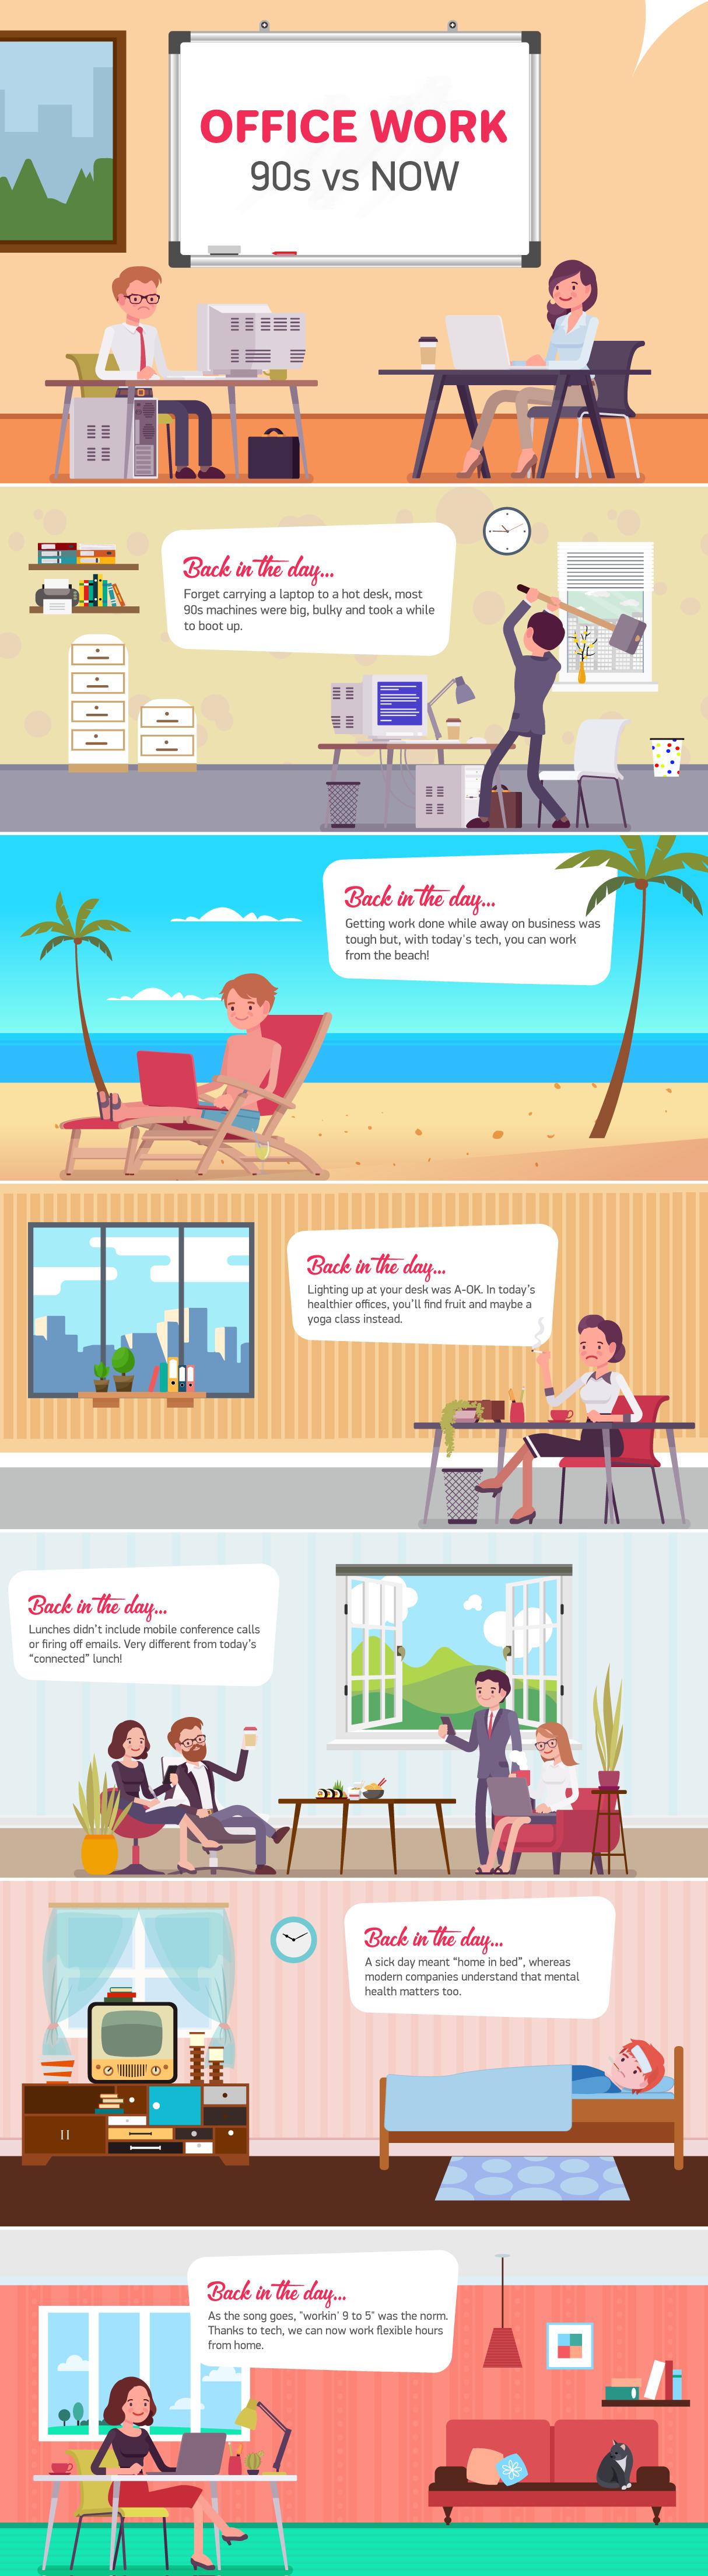 office-work-90s-vs-now-2